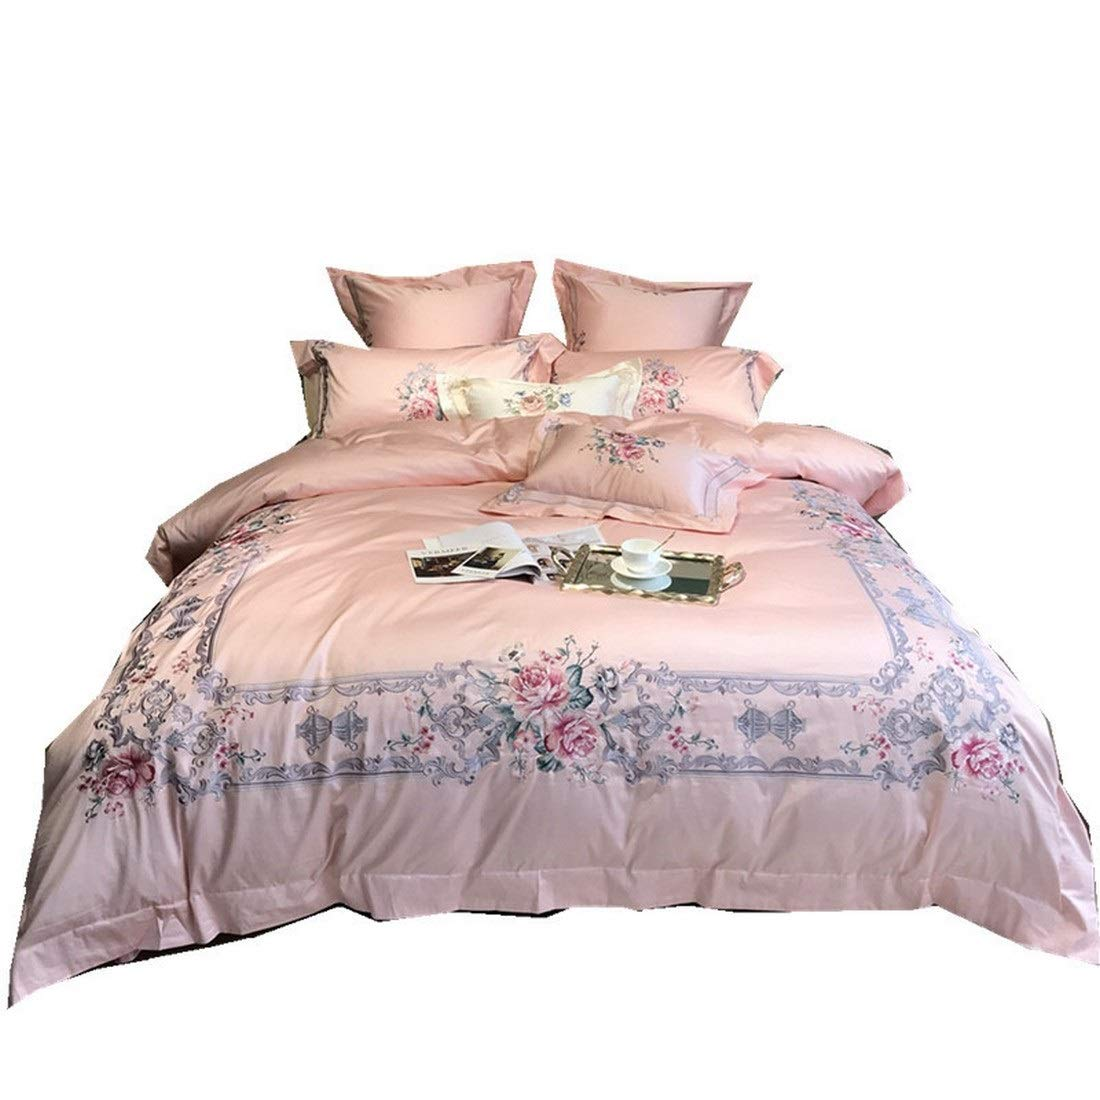 Kainuoo シンプルな花ピンクのハイエンド刺繍ピュアコットン寝具4点セット (Size : QUEEN) B07N8NQK5N  Queen